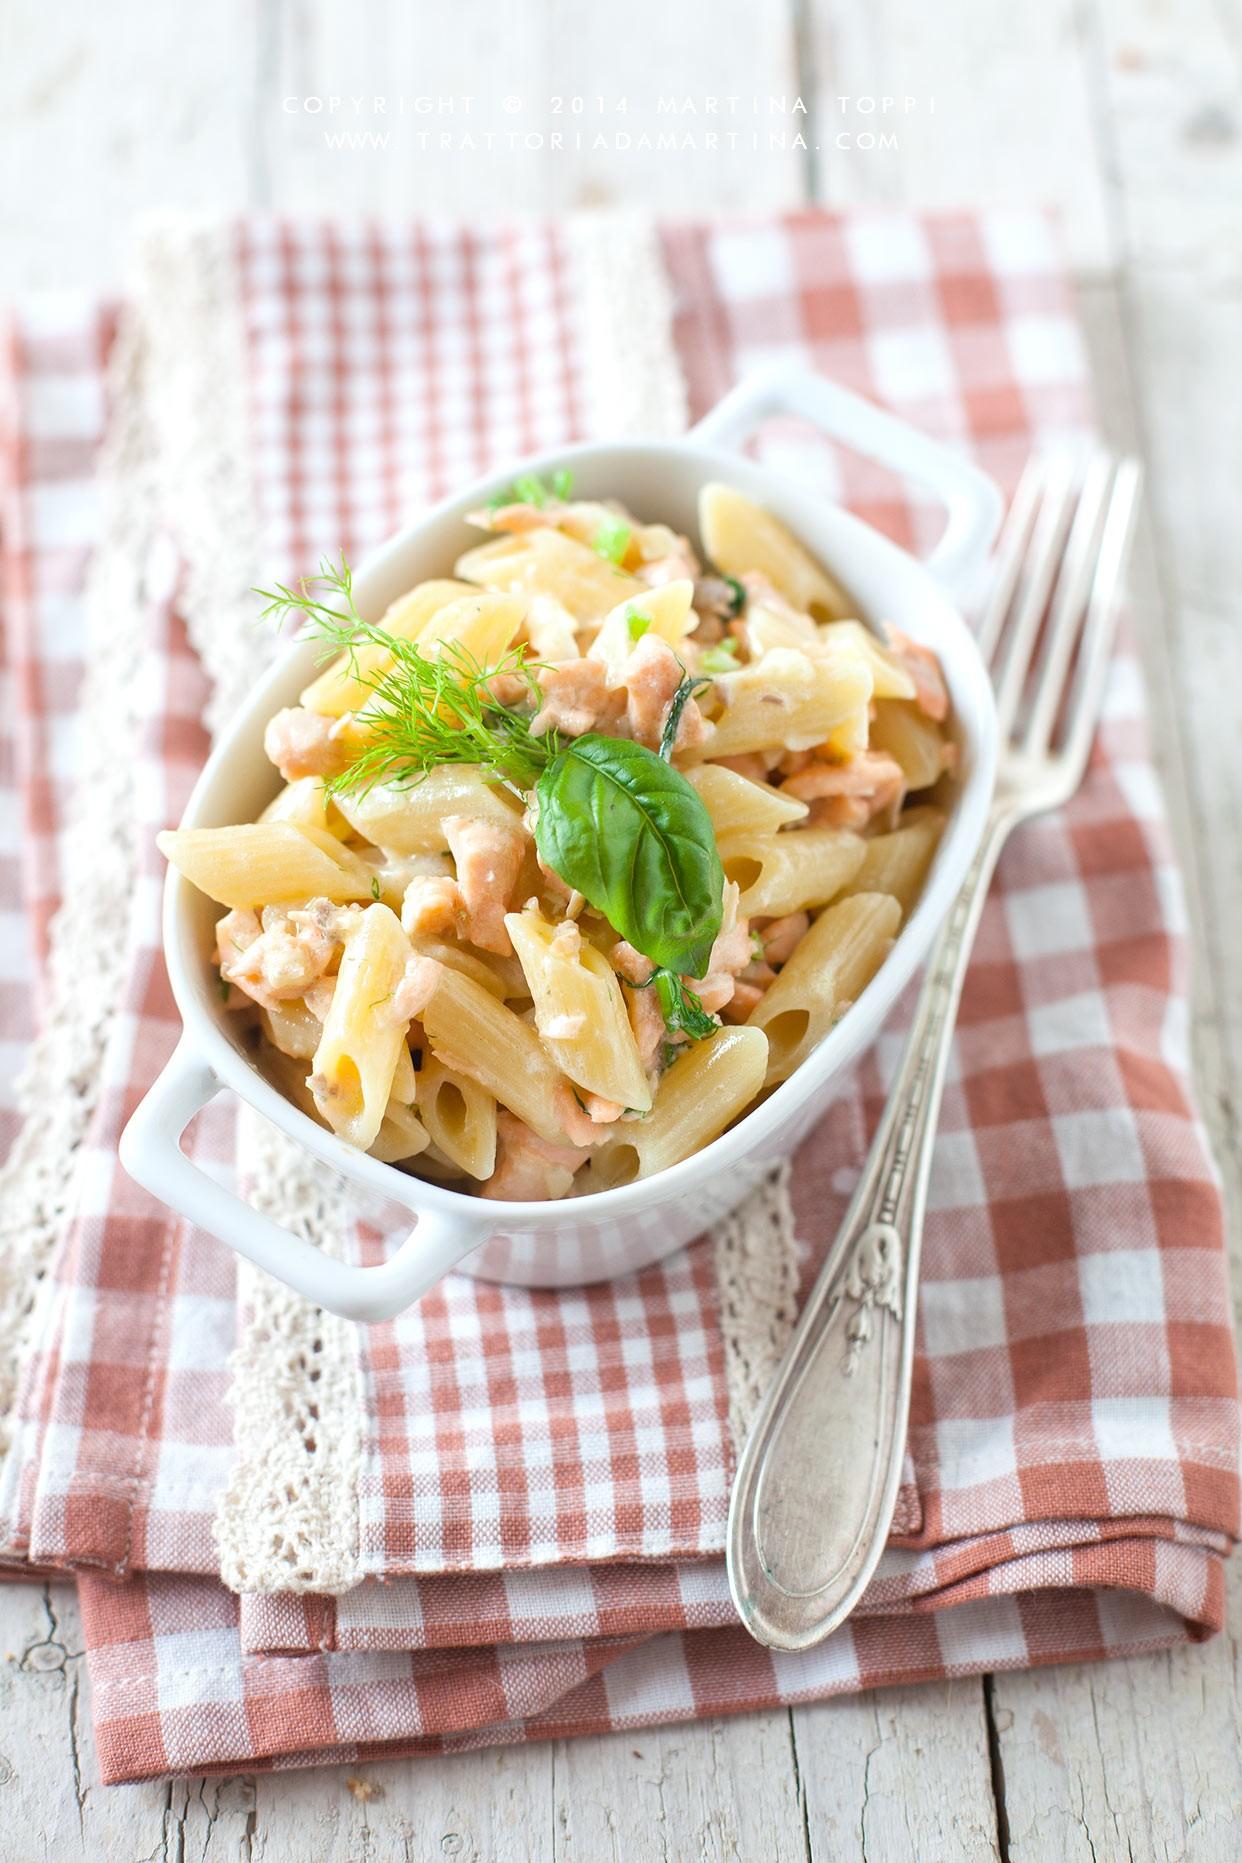 Pasta con salmone fresco